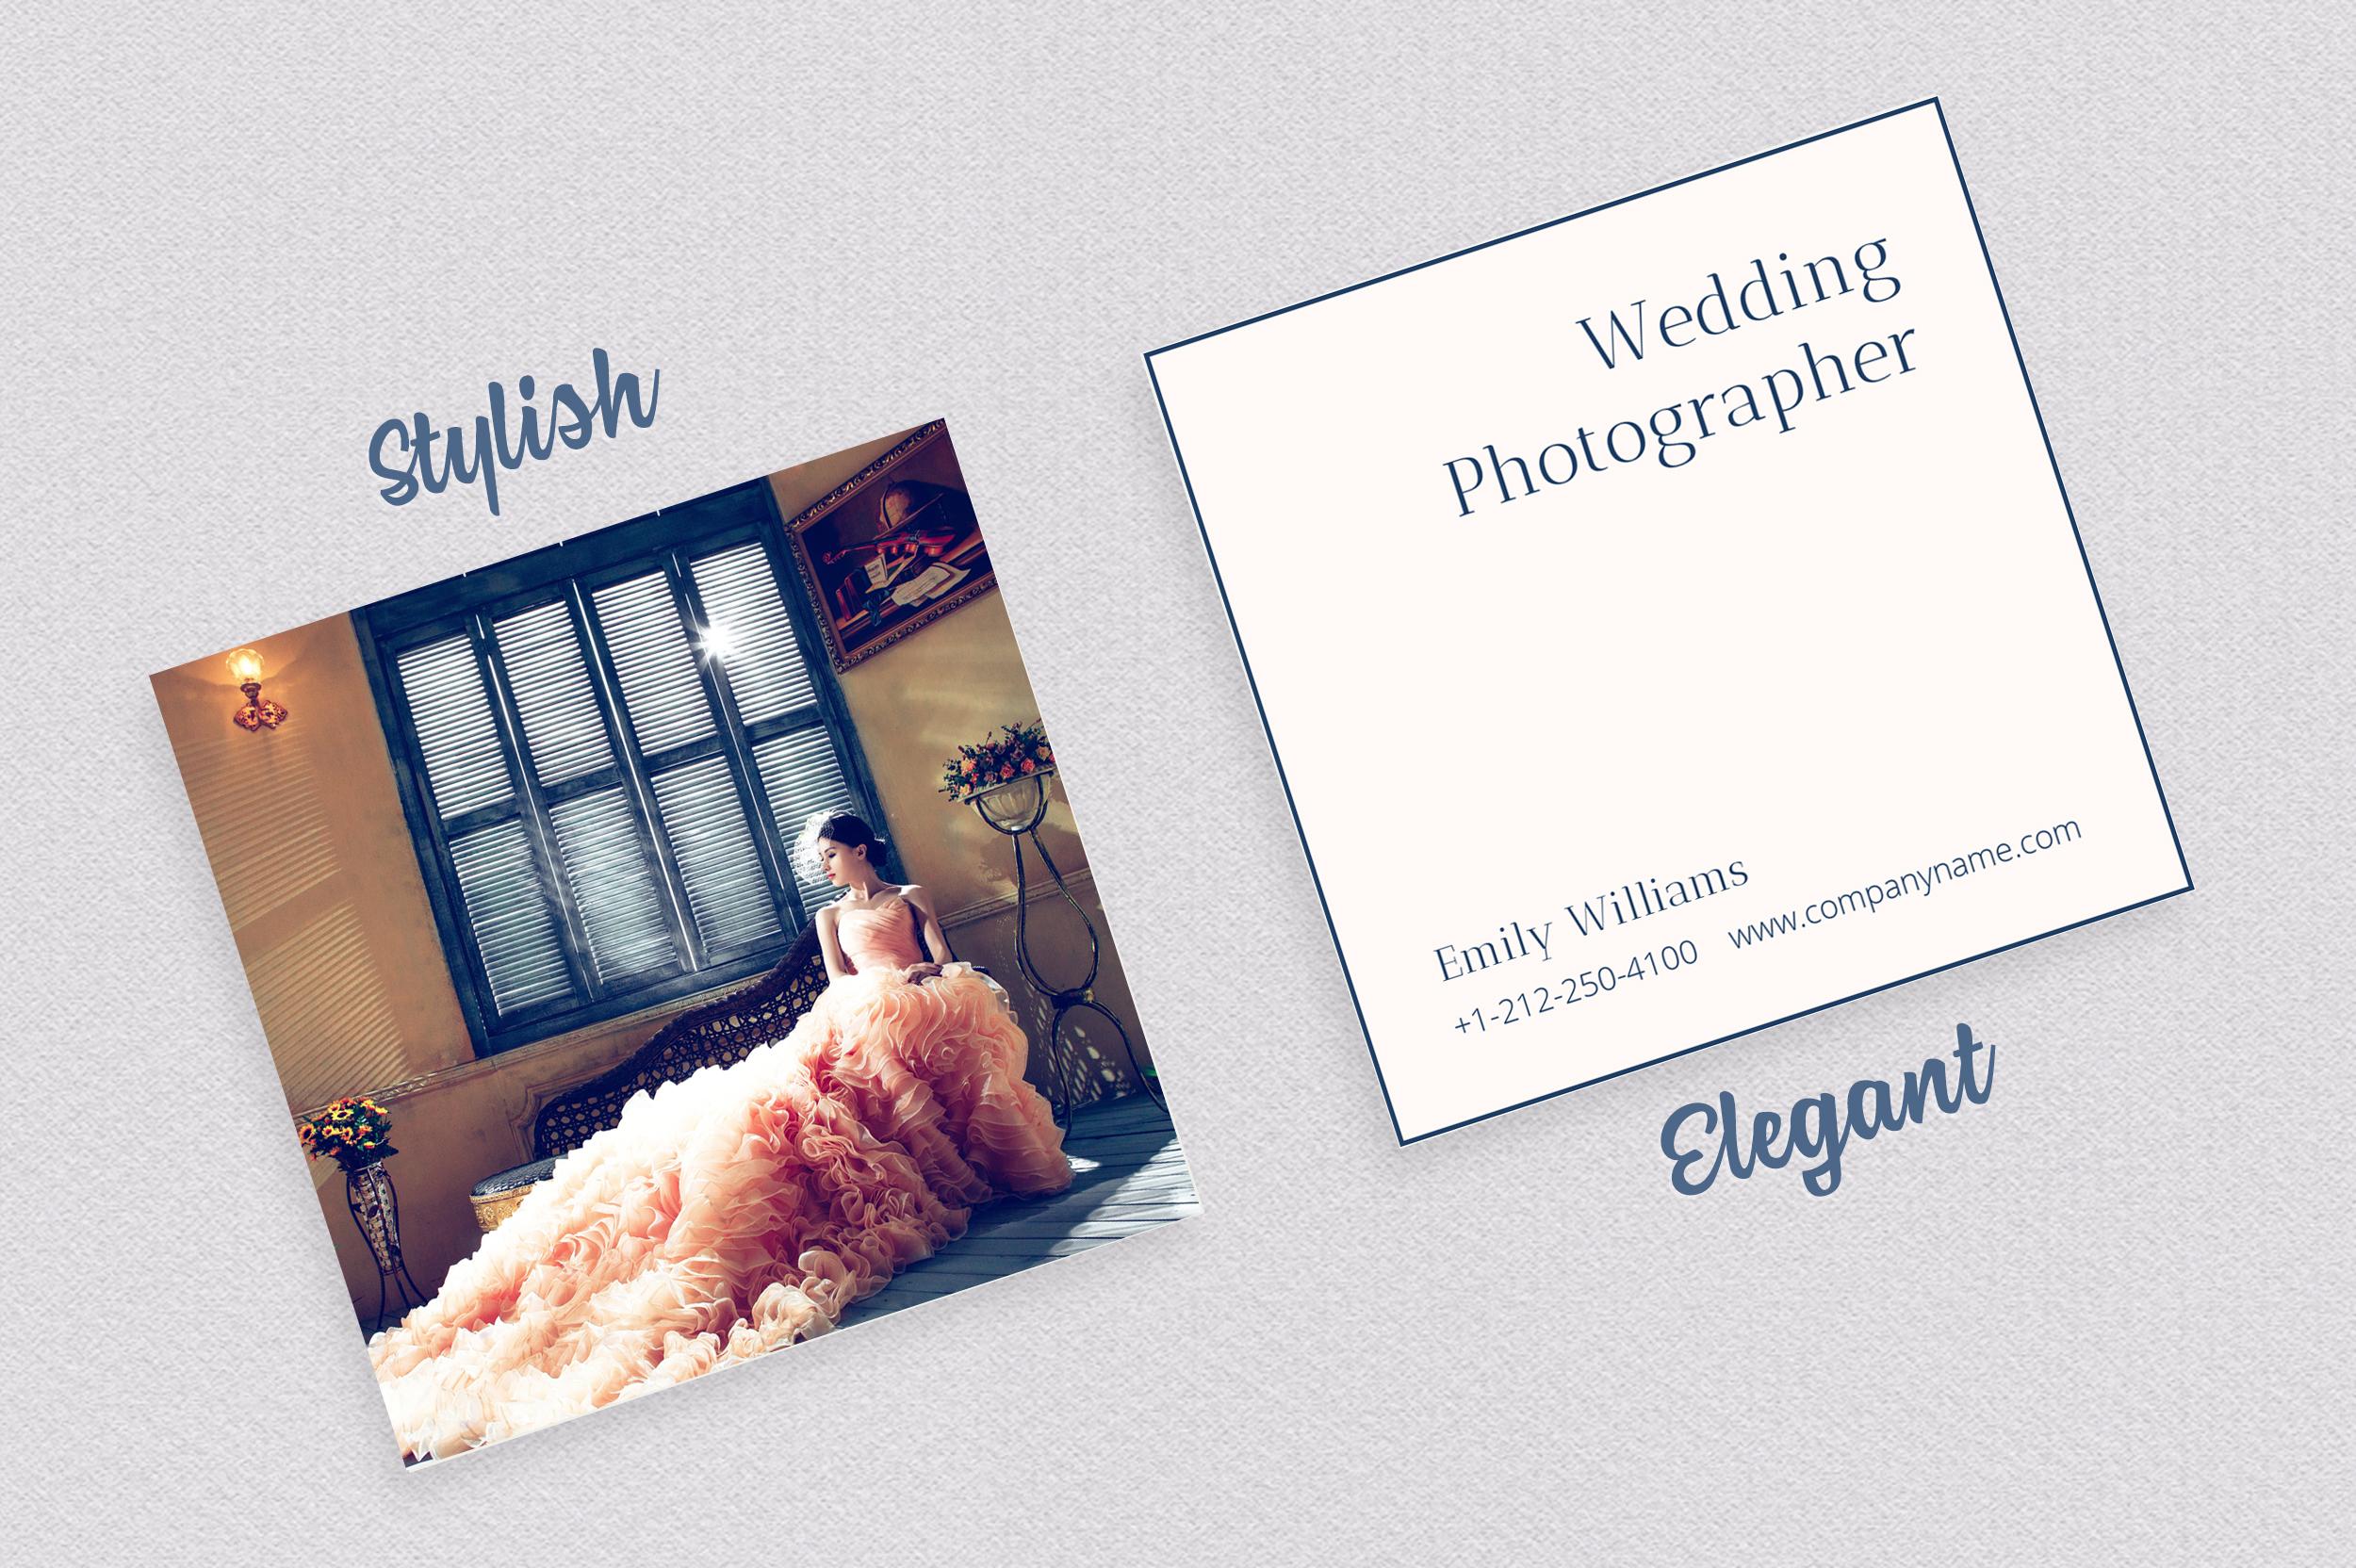 Wedding photography business card by mo design bundles wedding photography business card example image 4 colourmoves